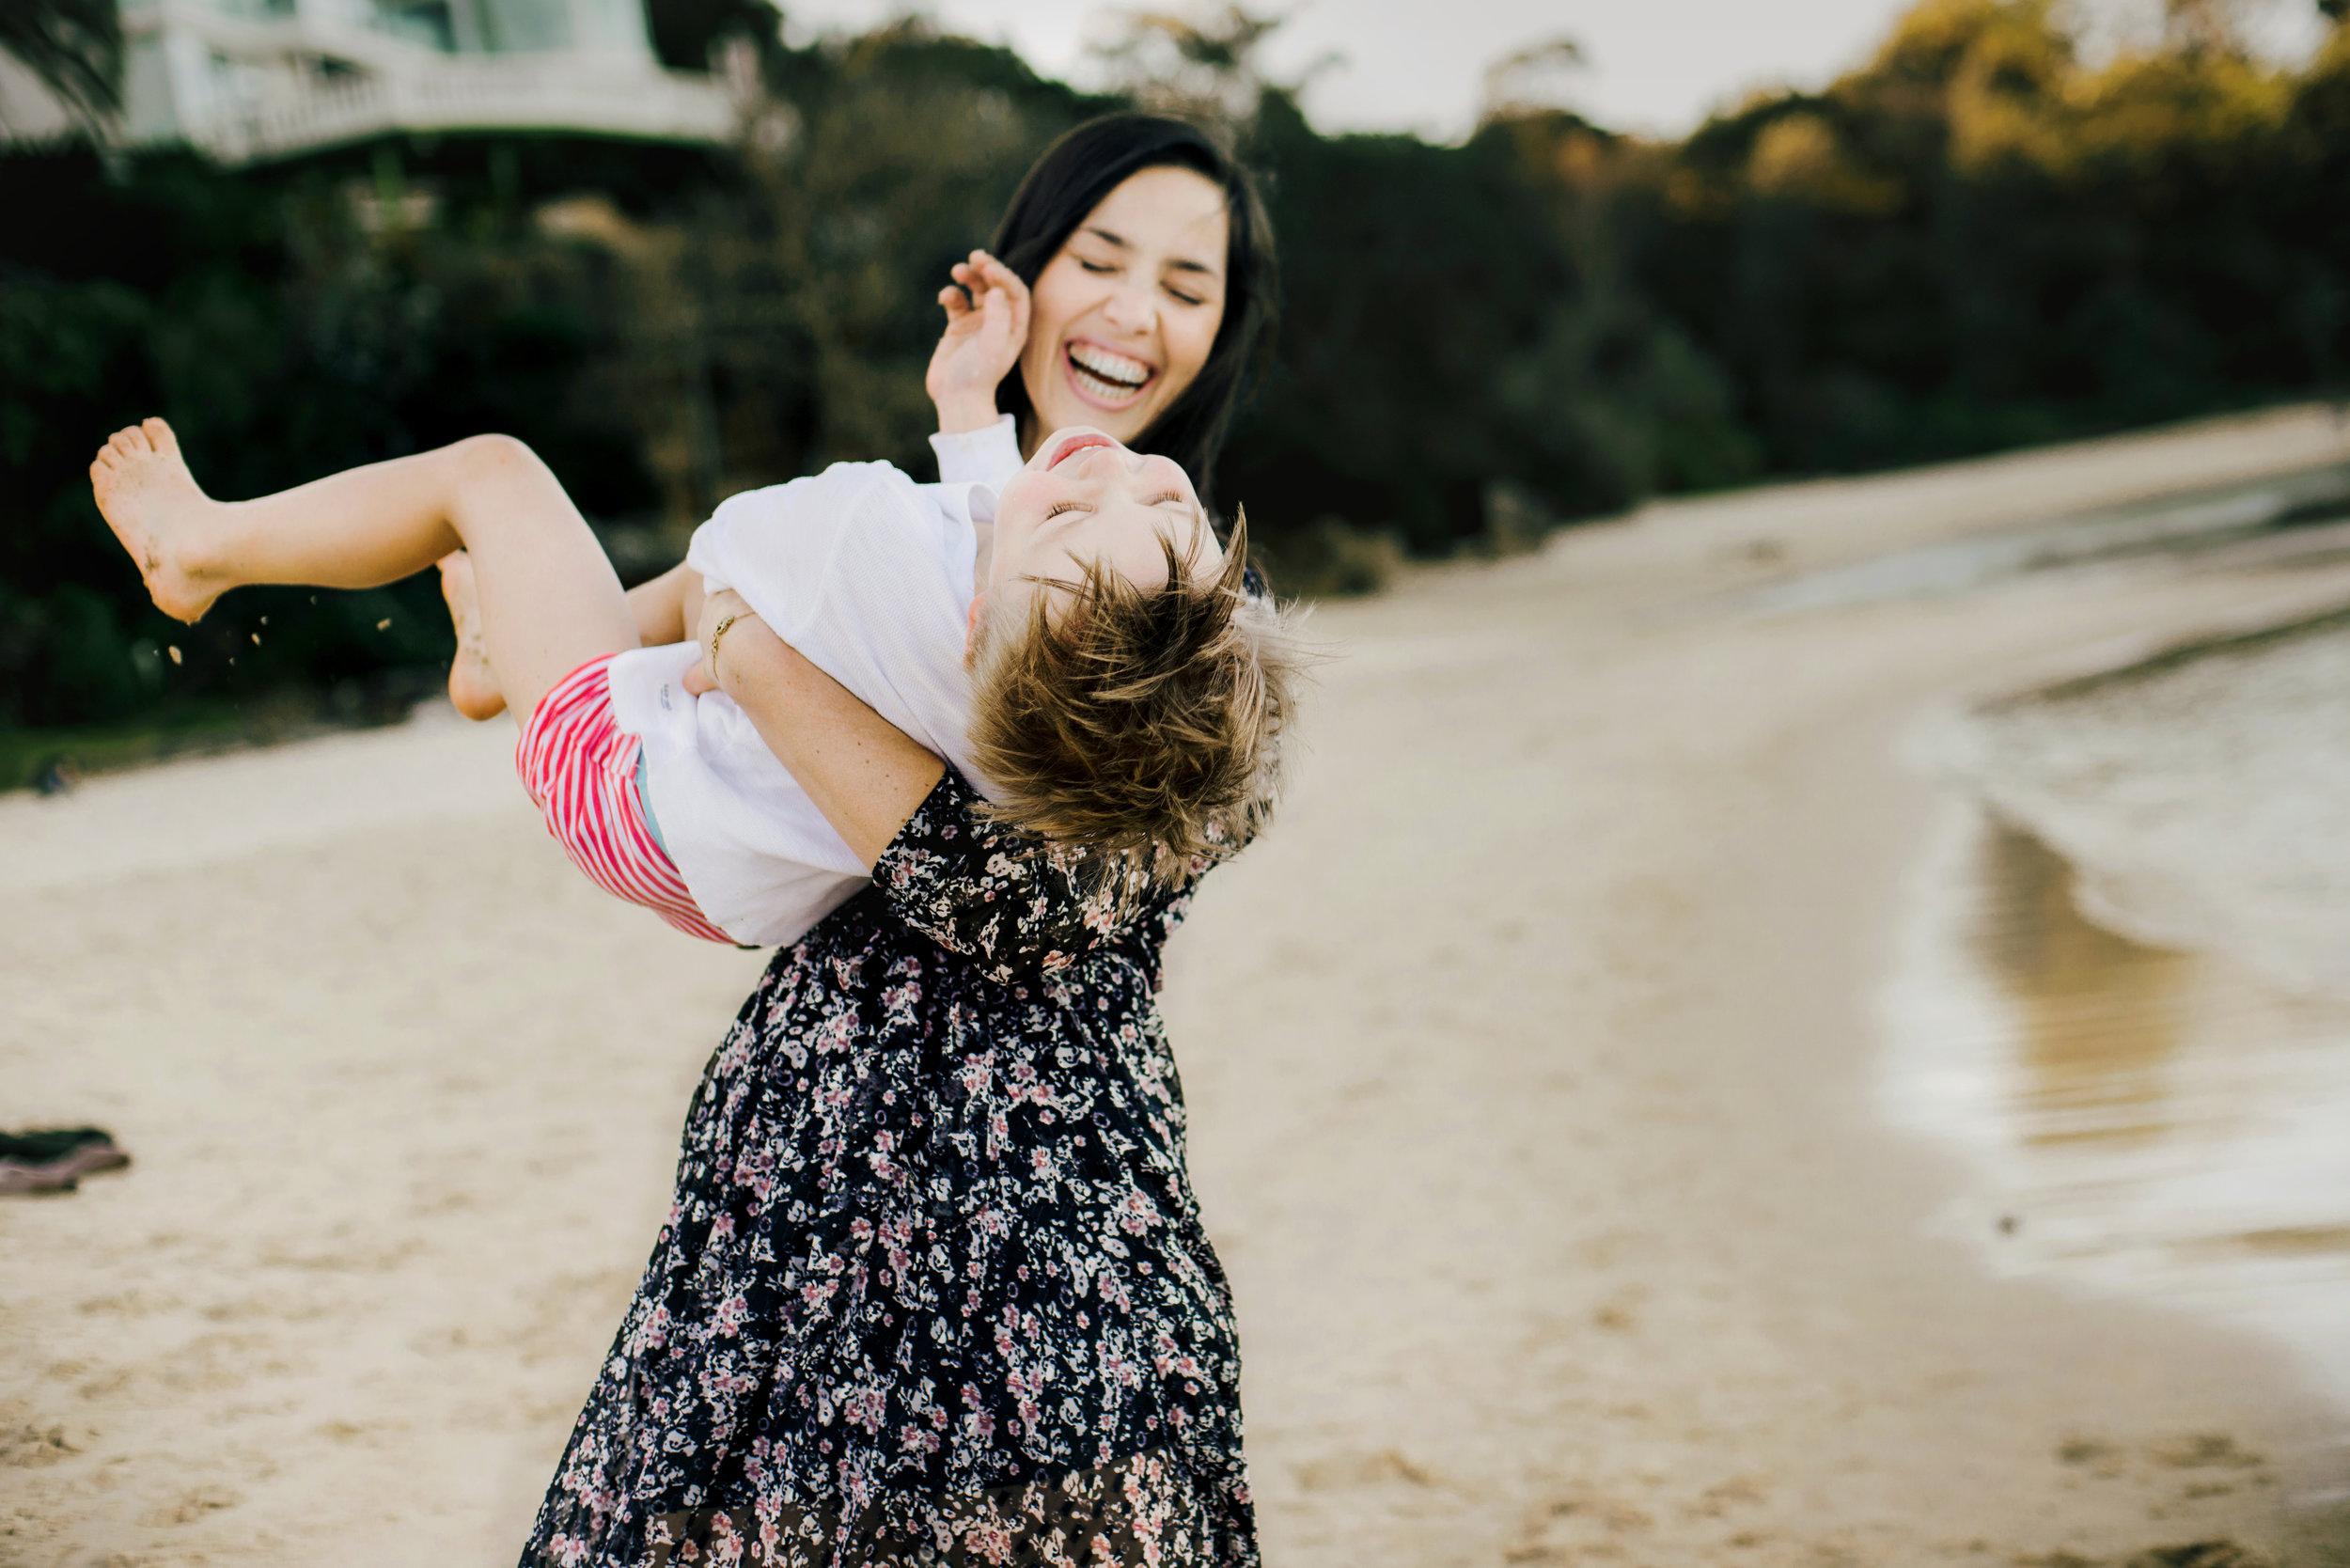 cindycavanagh-motherhoodphotographersydneyweb (2 of 2)b.jpg